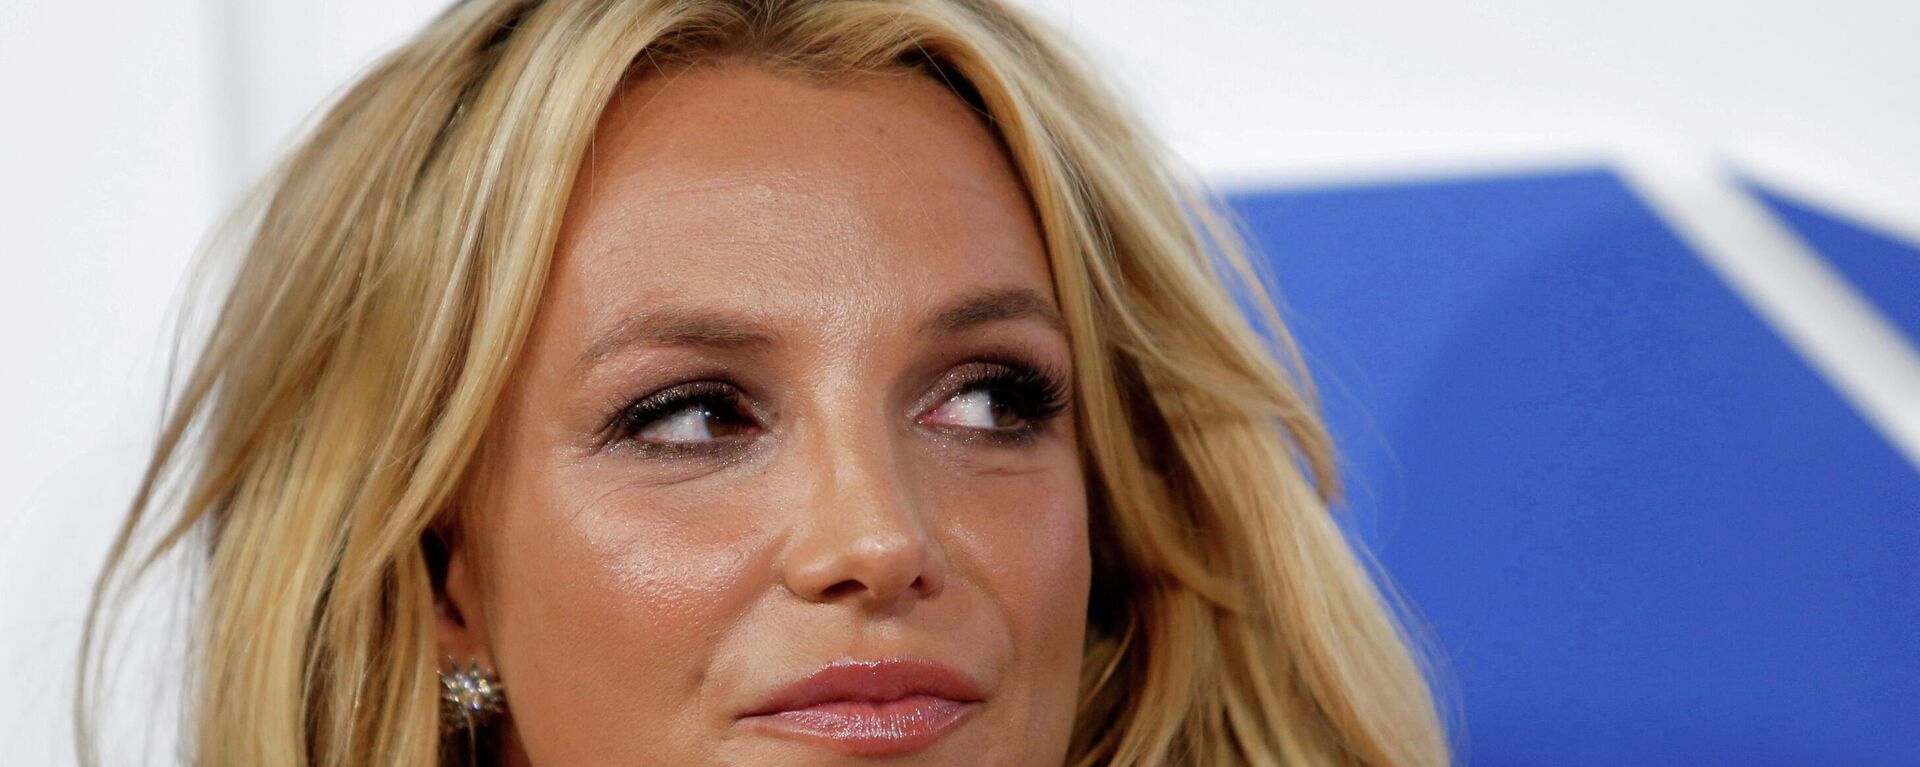 Britney Spears, cantante estadounidense - Sputnik Mundo, 1920, 25.06.2021